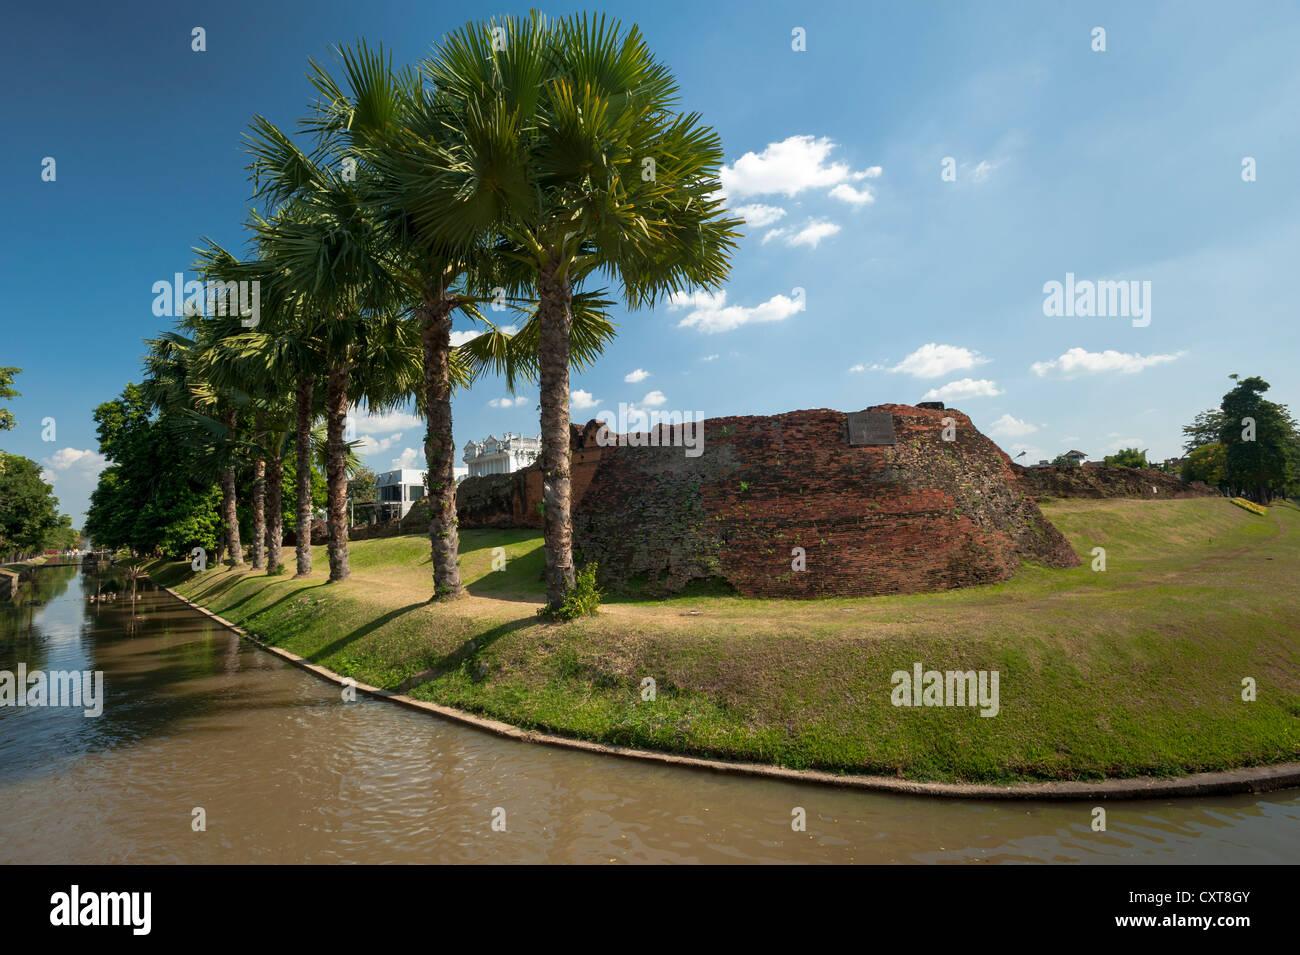 Ancient city walls, moat, Chiang Mai, Northern Thailand, Thailand, Asia - Stock Image